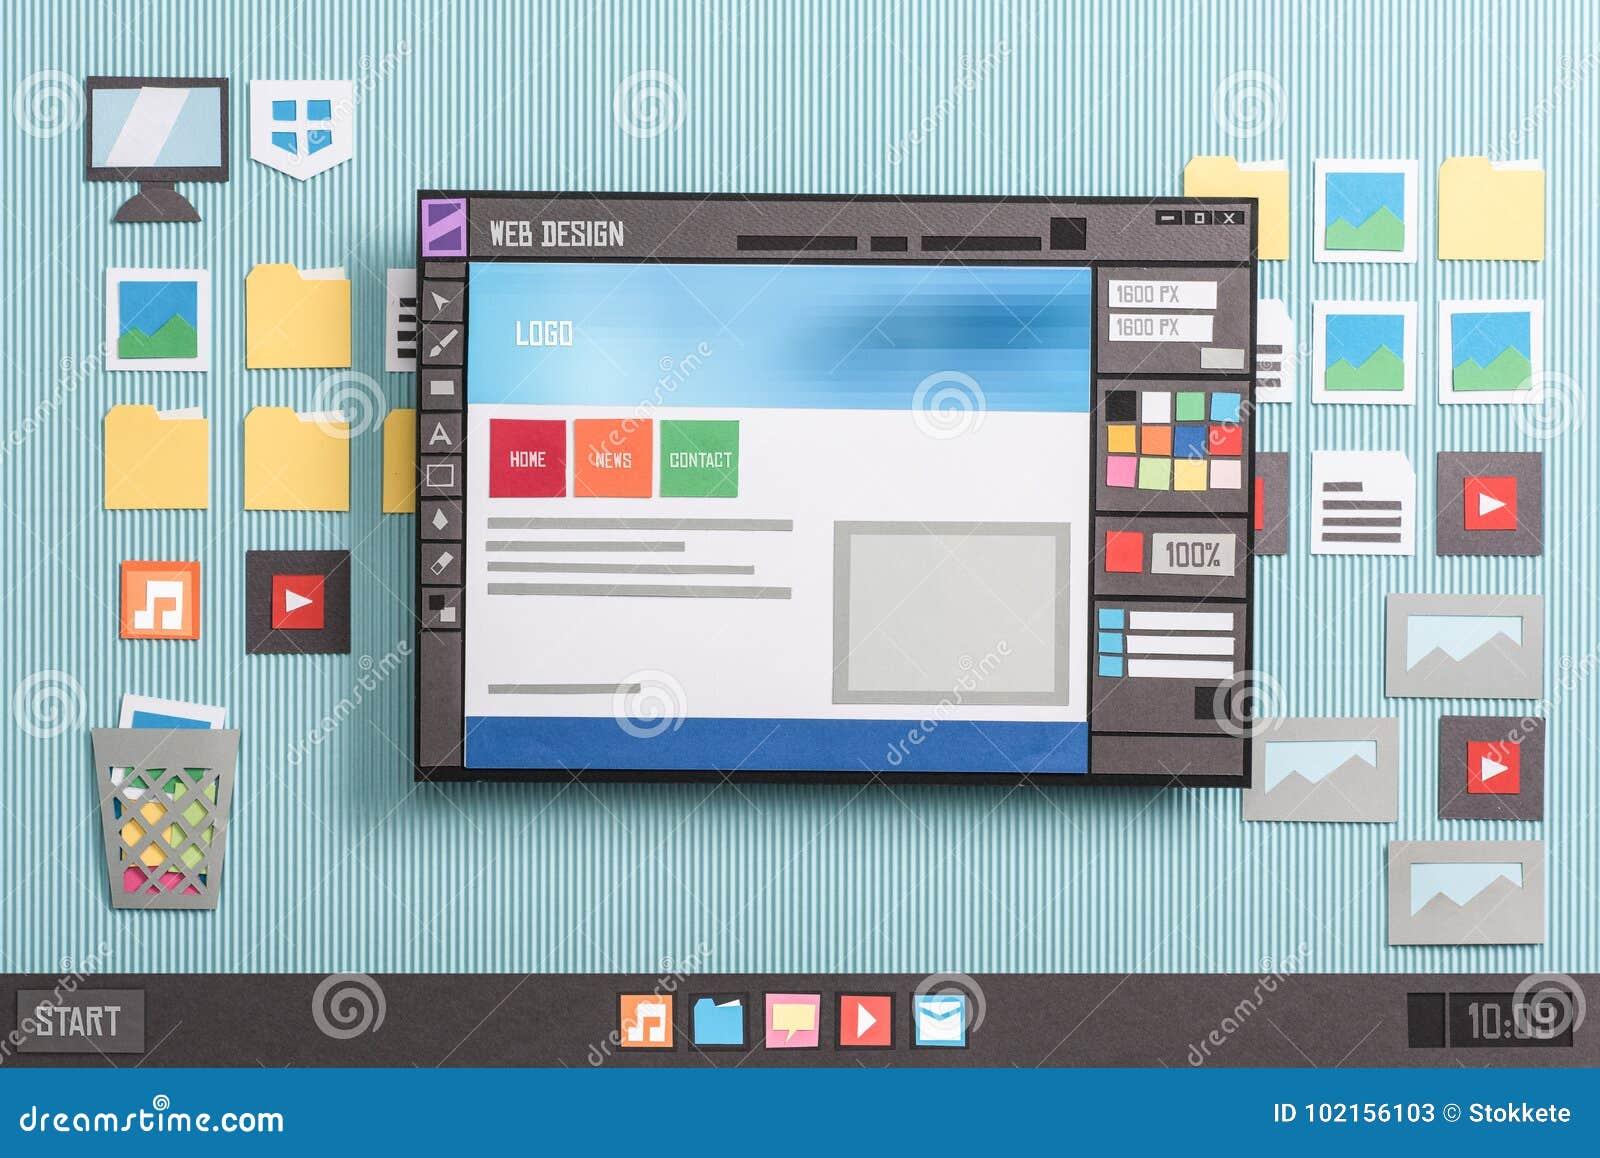 Web Design Software Stock Image Image Of Application 102156103